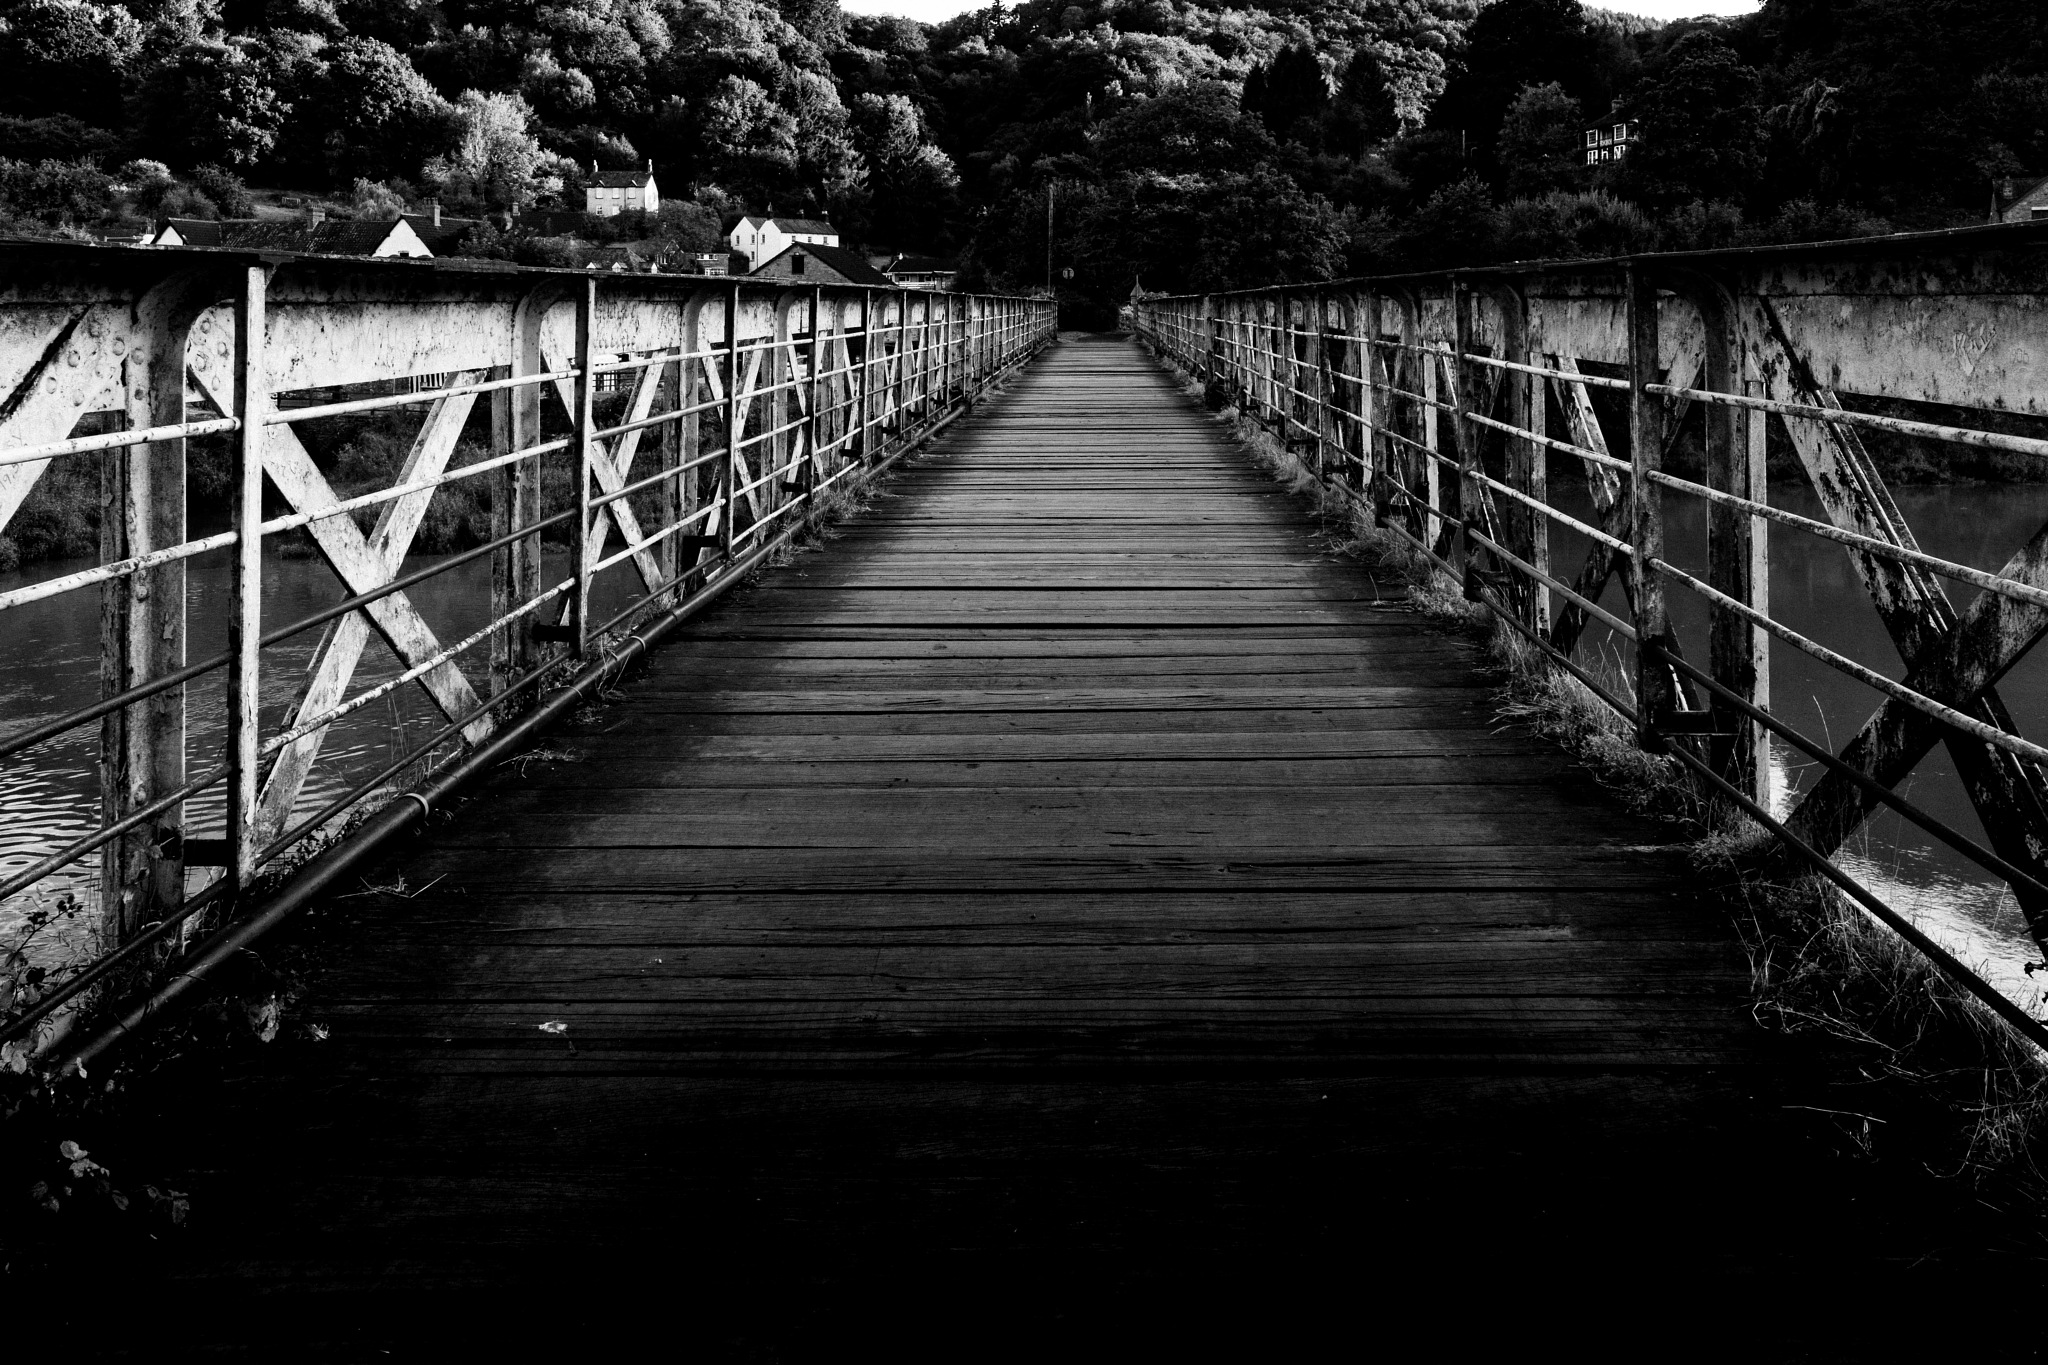 Bridge by J.B Photography